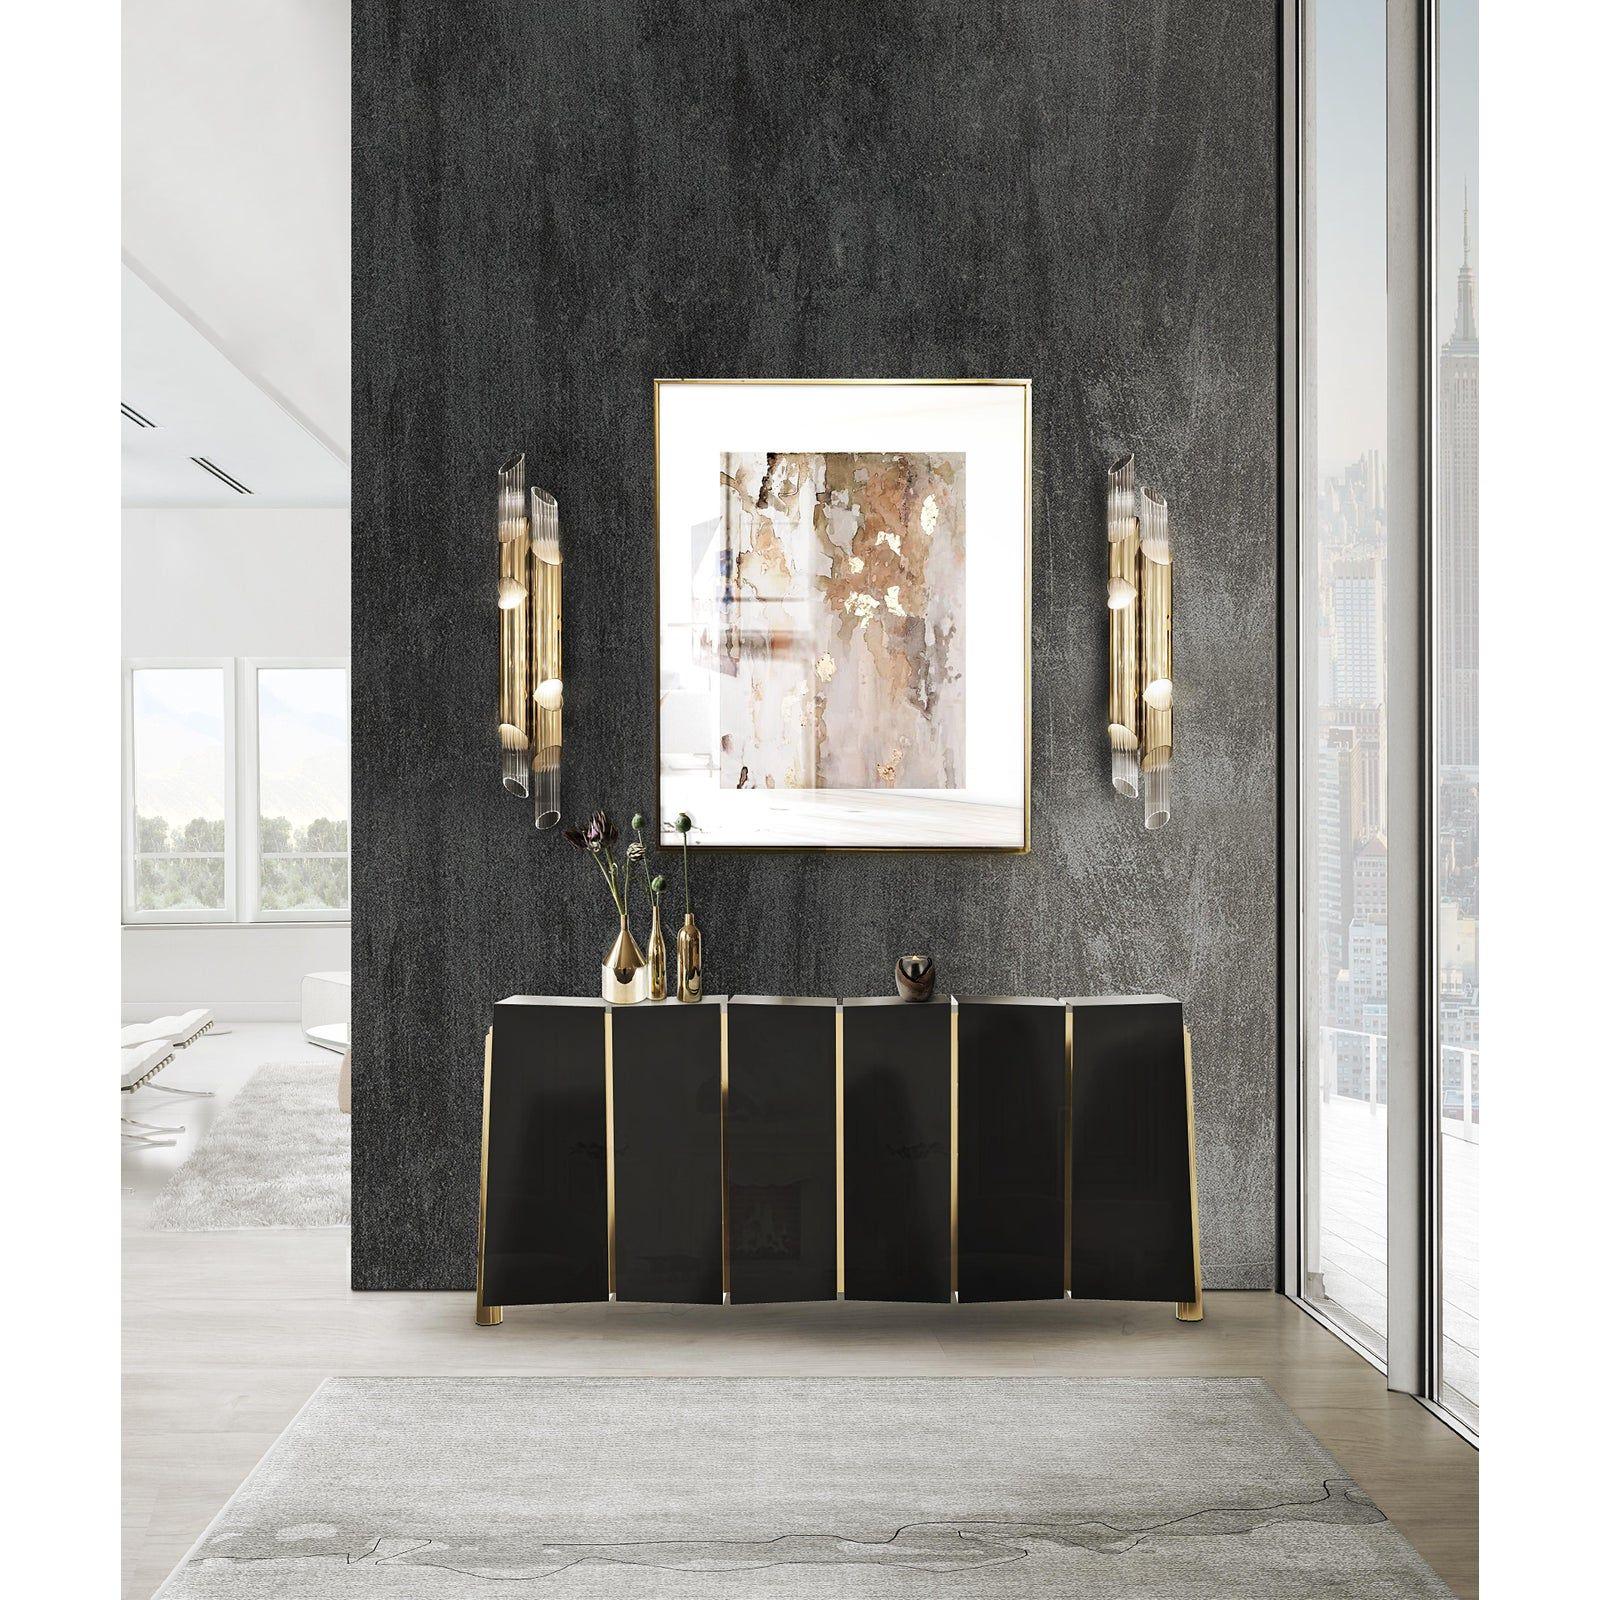 Draycott Ii Wall From Covet Paris Luxury Furniture